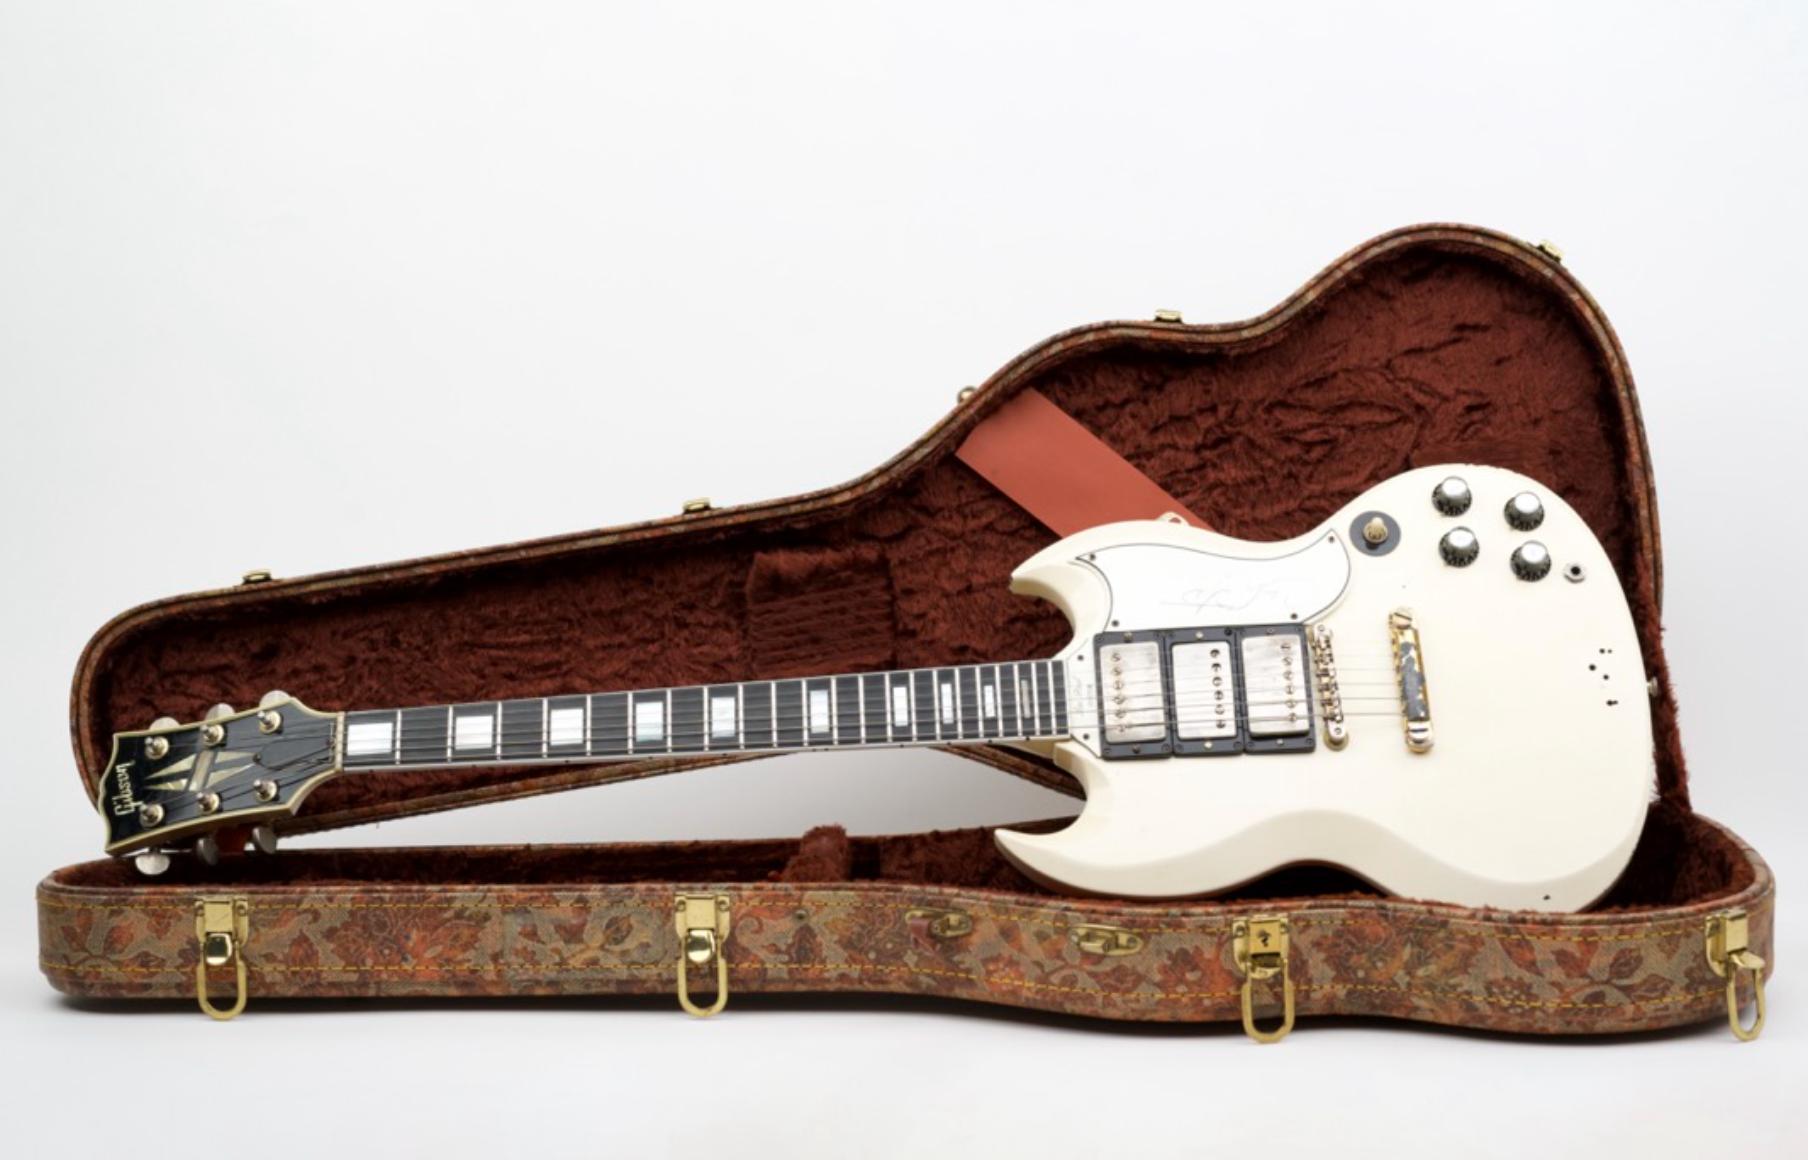 Carlos Santana Gibson SG Guitar (Signed)